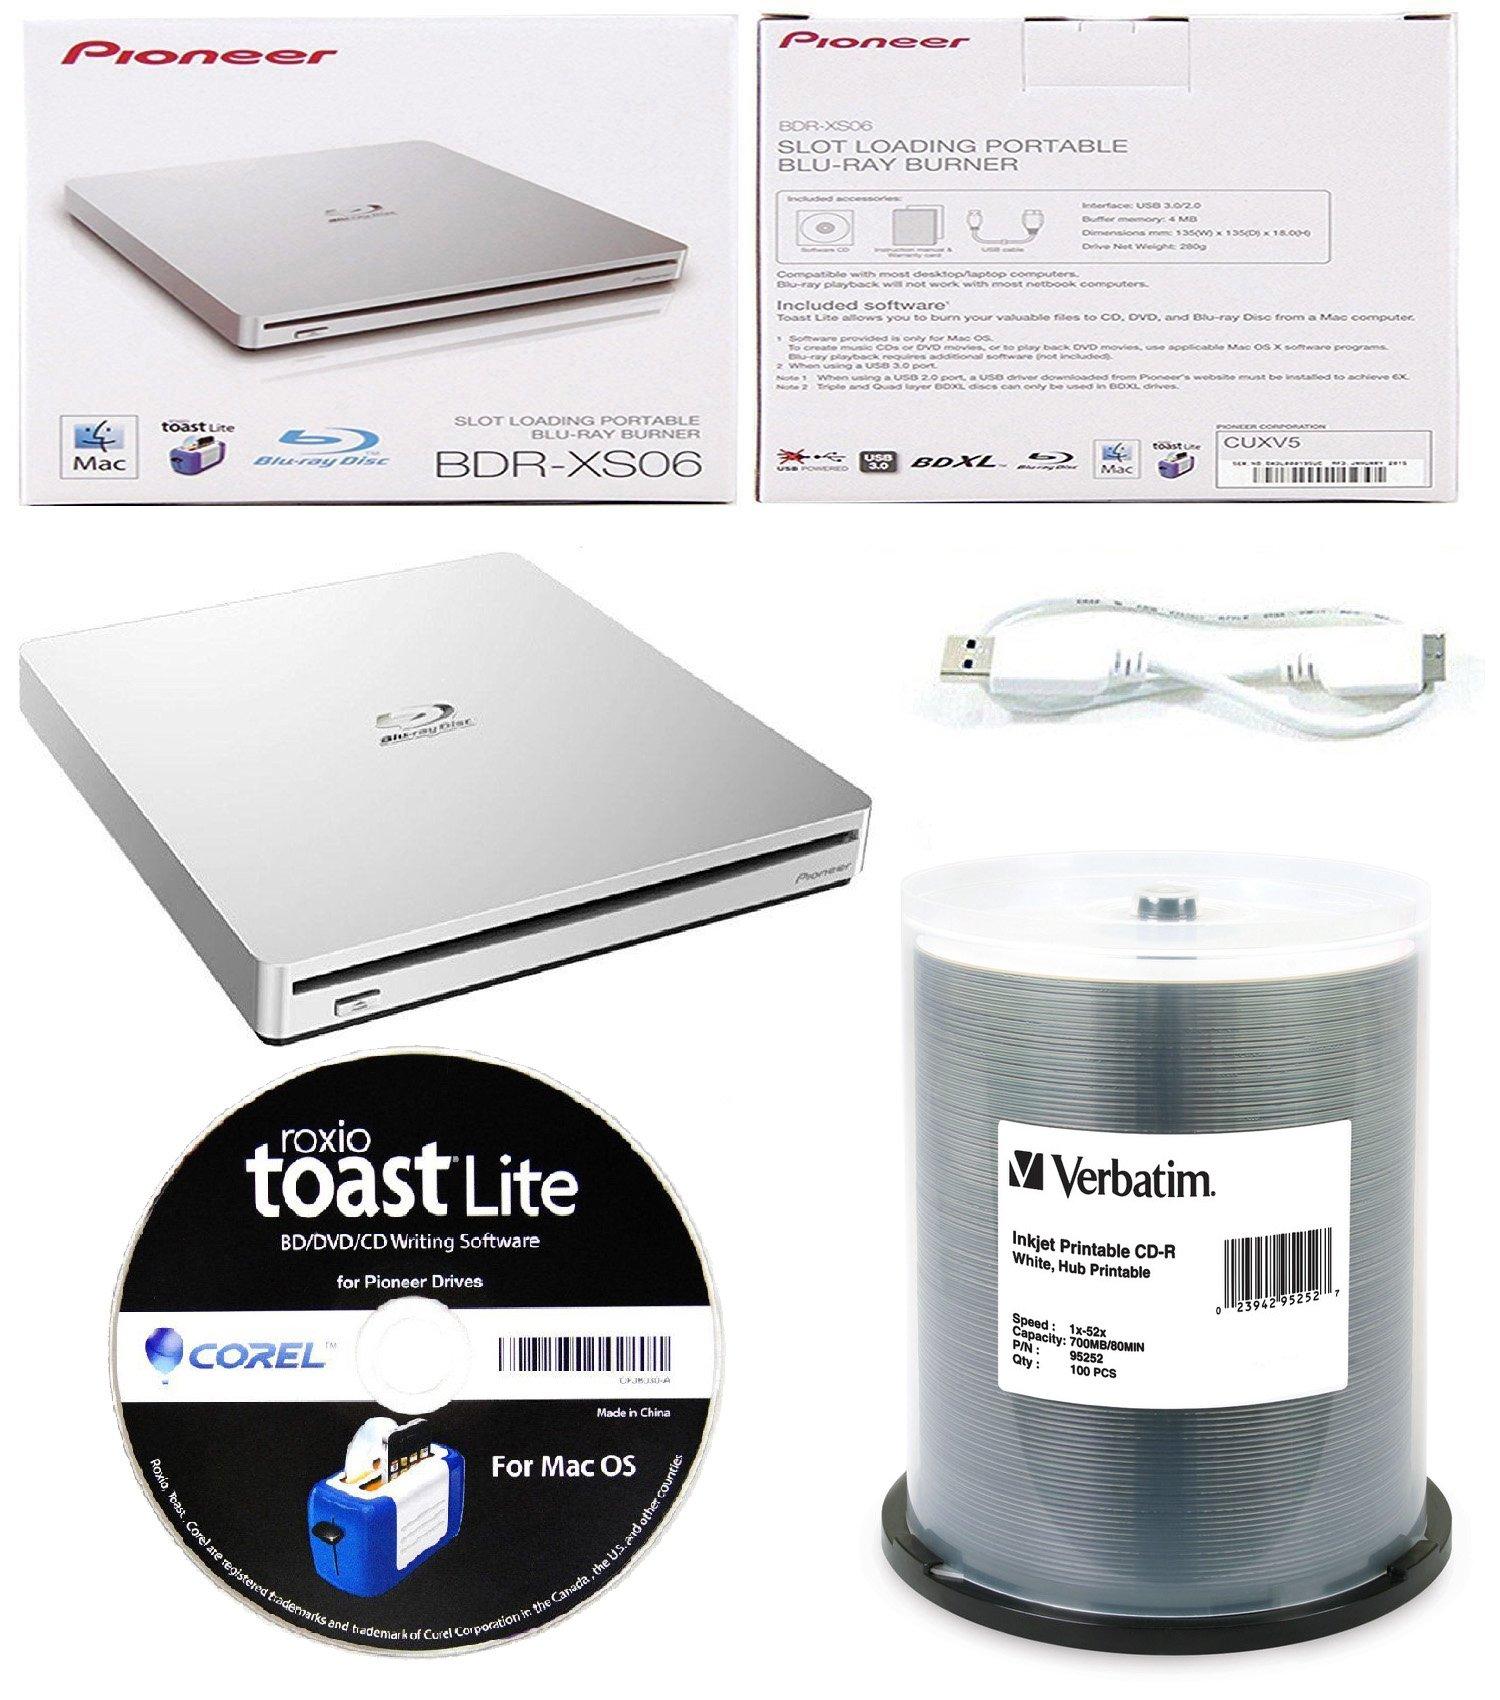 Pioneer 6x BDR-XS06 Slim Slot Portable External Blu-ray BDXL Burner, Roxio Toast Lite Software and USB Cable Bundle with 100pk CD-R Verbatim 700MB 52X DataLifePlus White Inkjet, Hub Printable